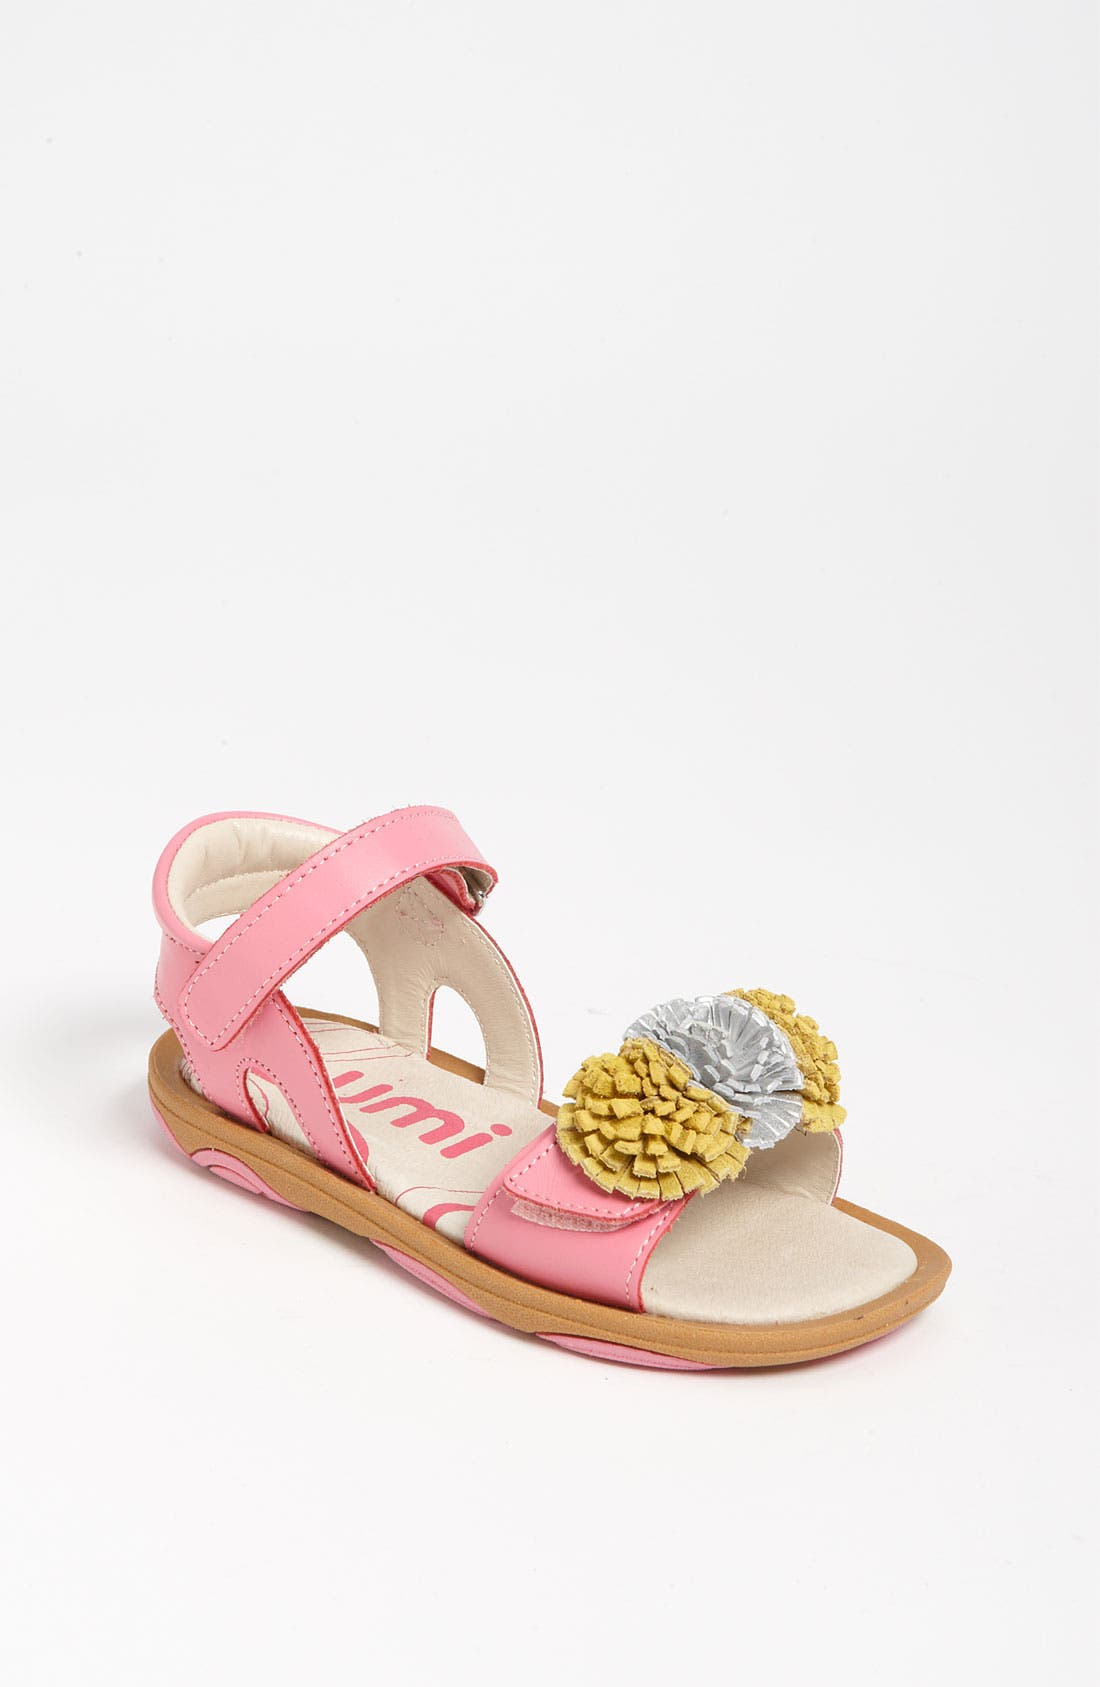 Main Image - Umi 'Serenna' Adjustable Sandal (Toddler, Little Kid & Big Kid)